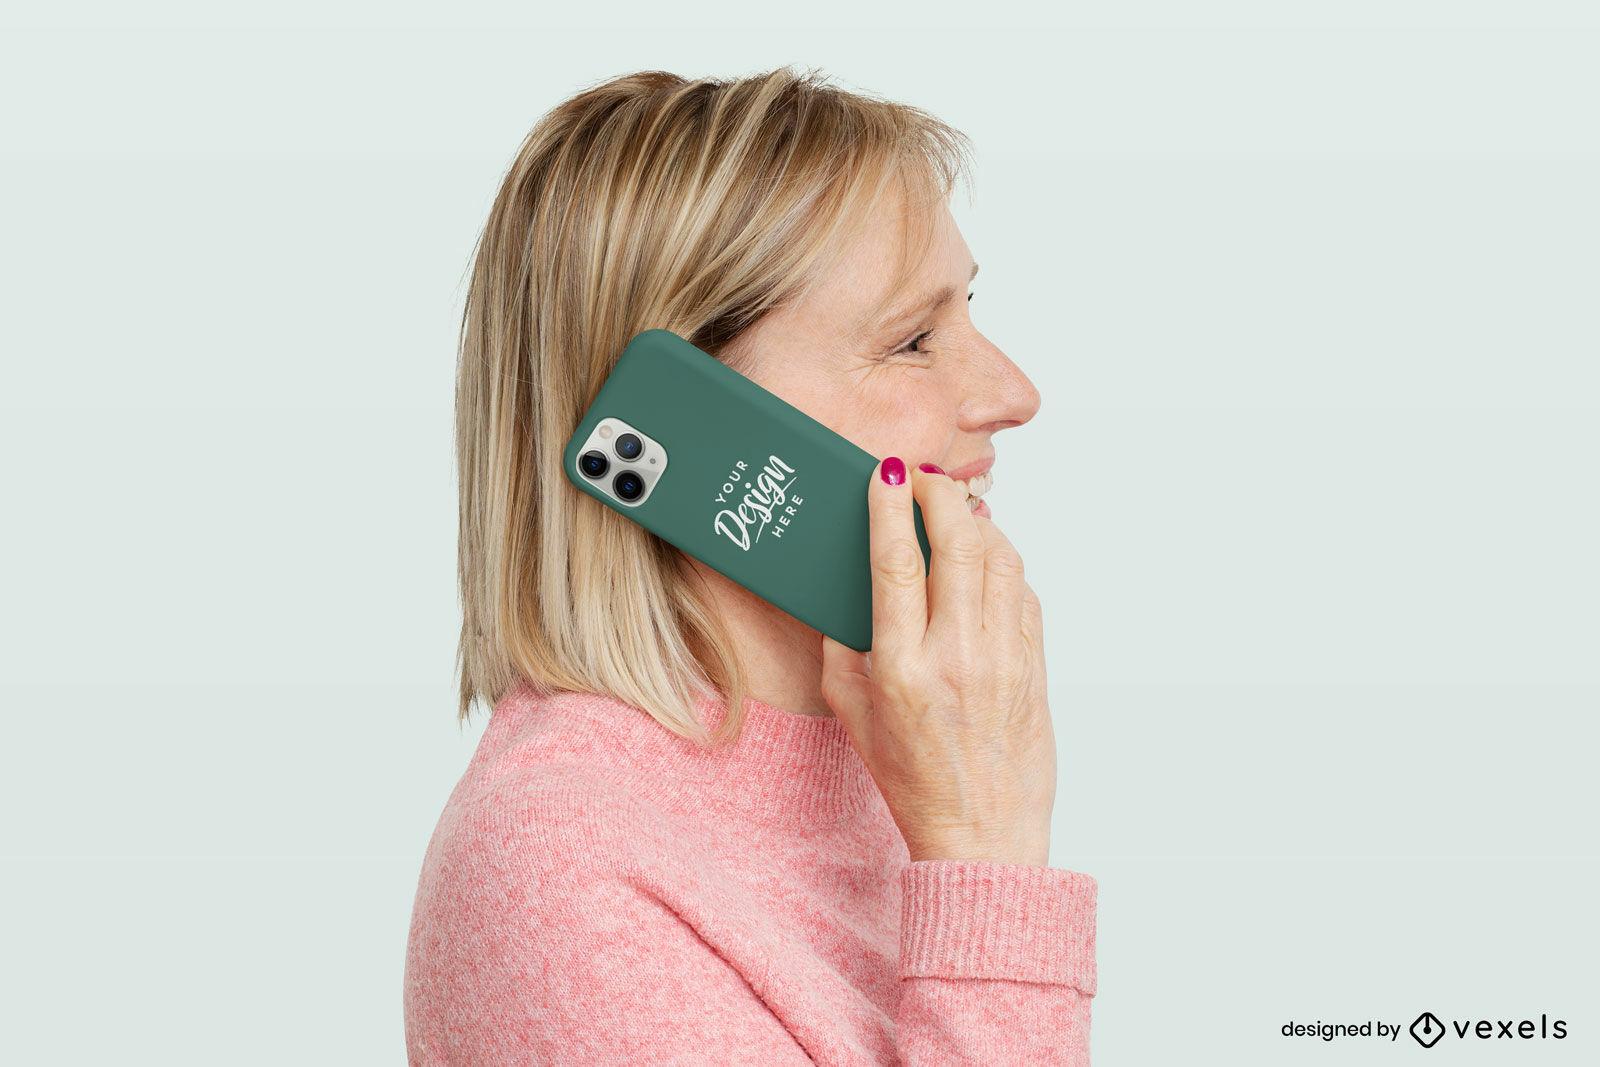 Maquete de capa de telefone feminina e verde